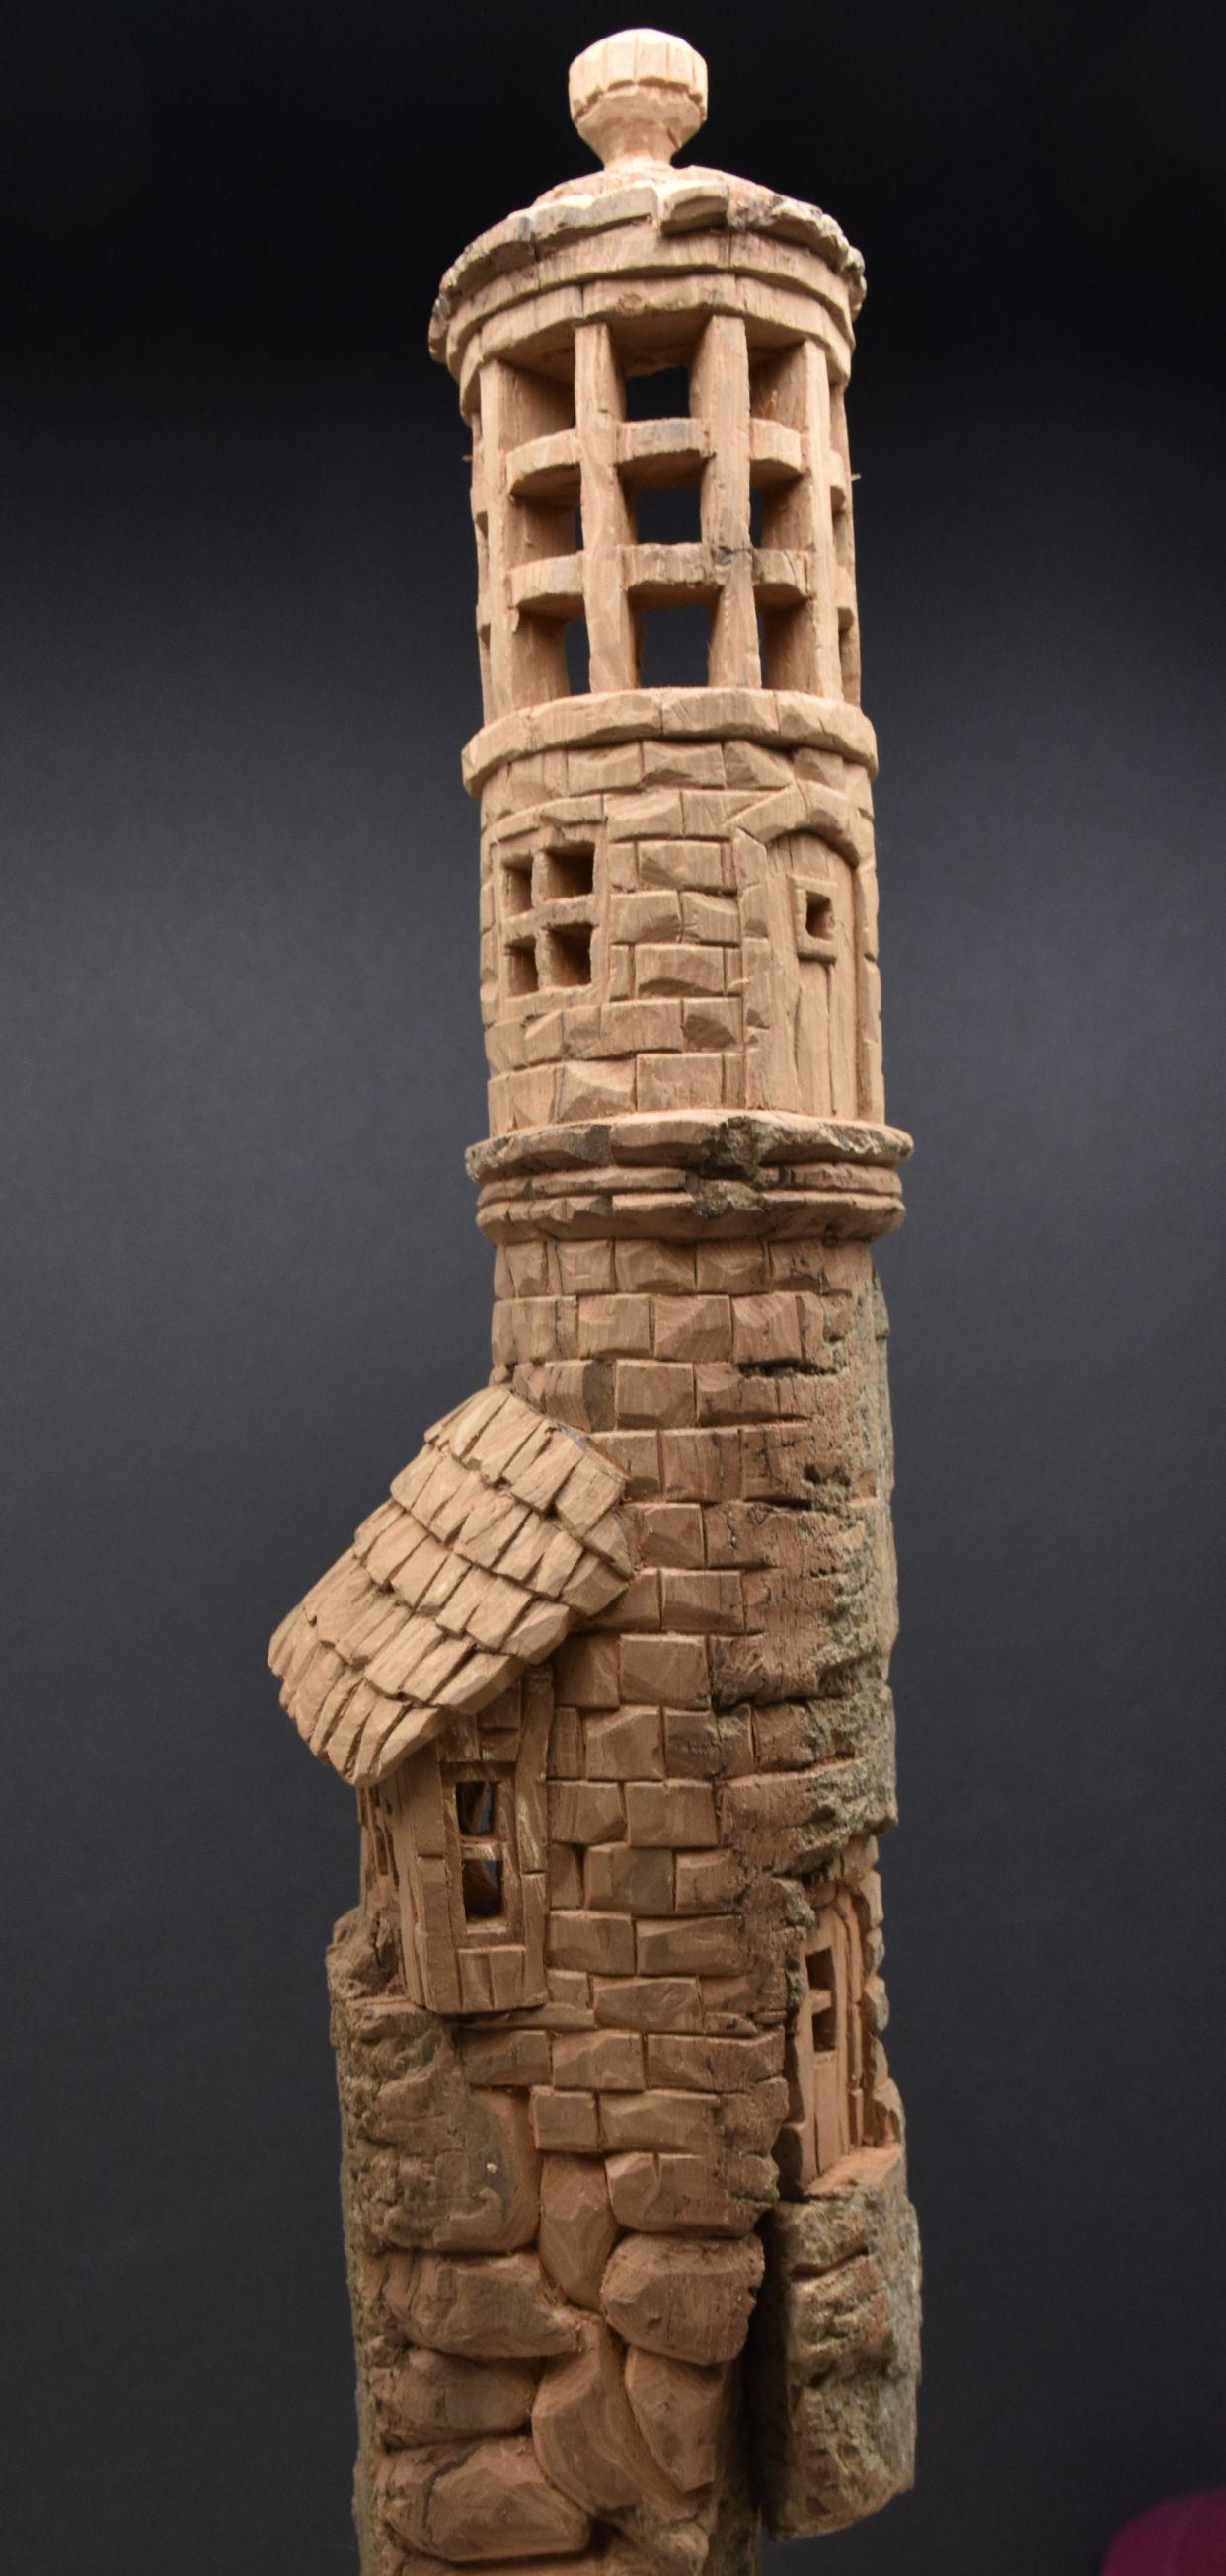 Wood carvings by mark sheridan carving in